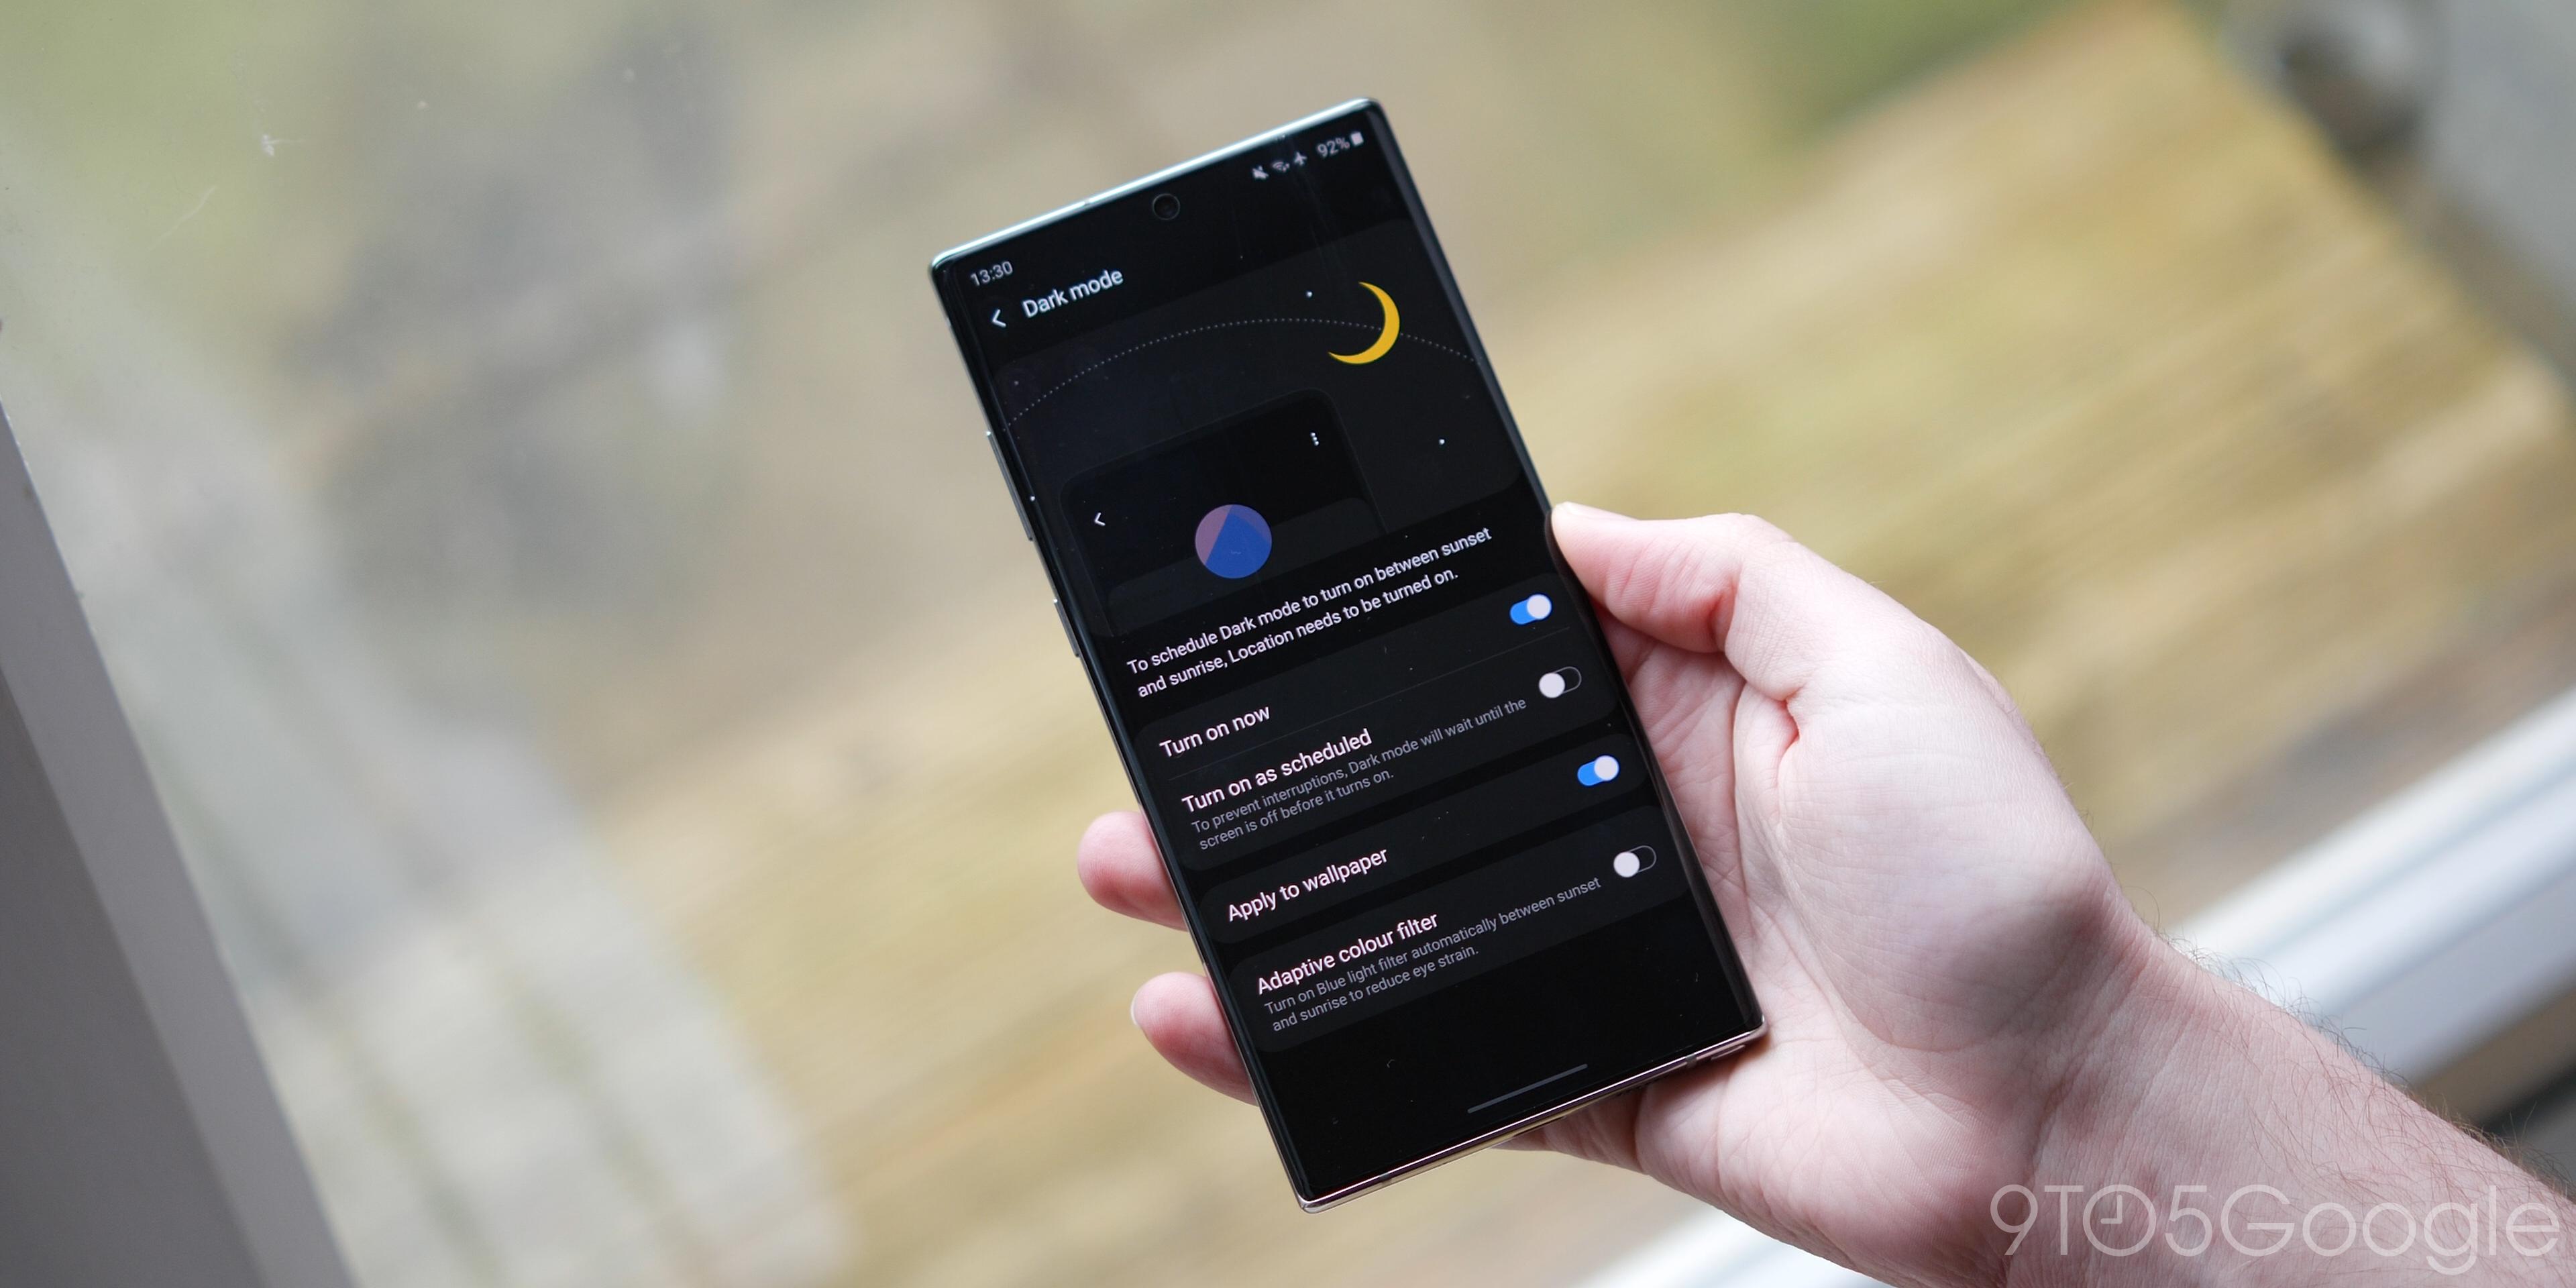 one ui 2.0 features - dark mode